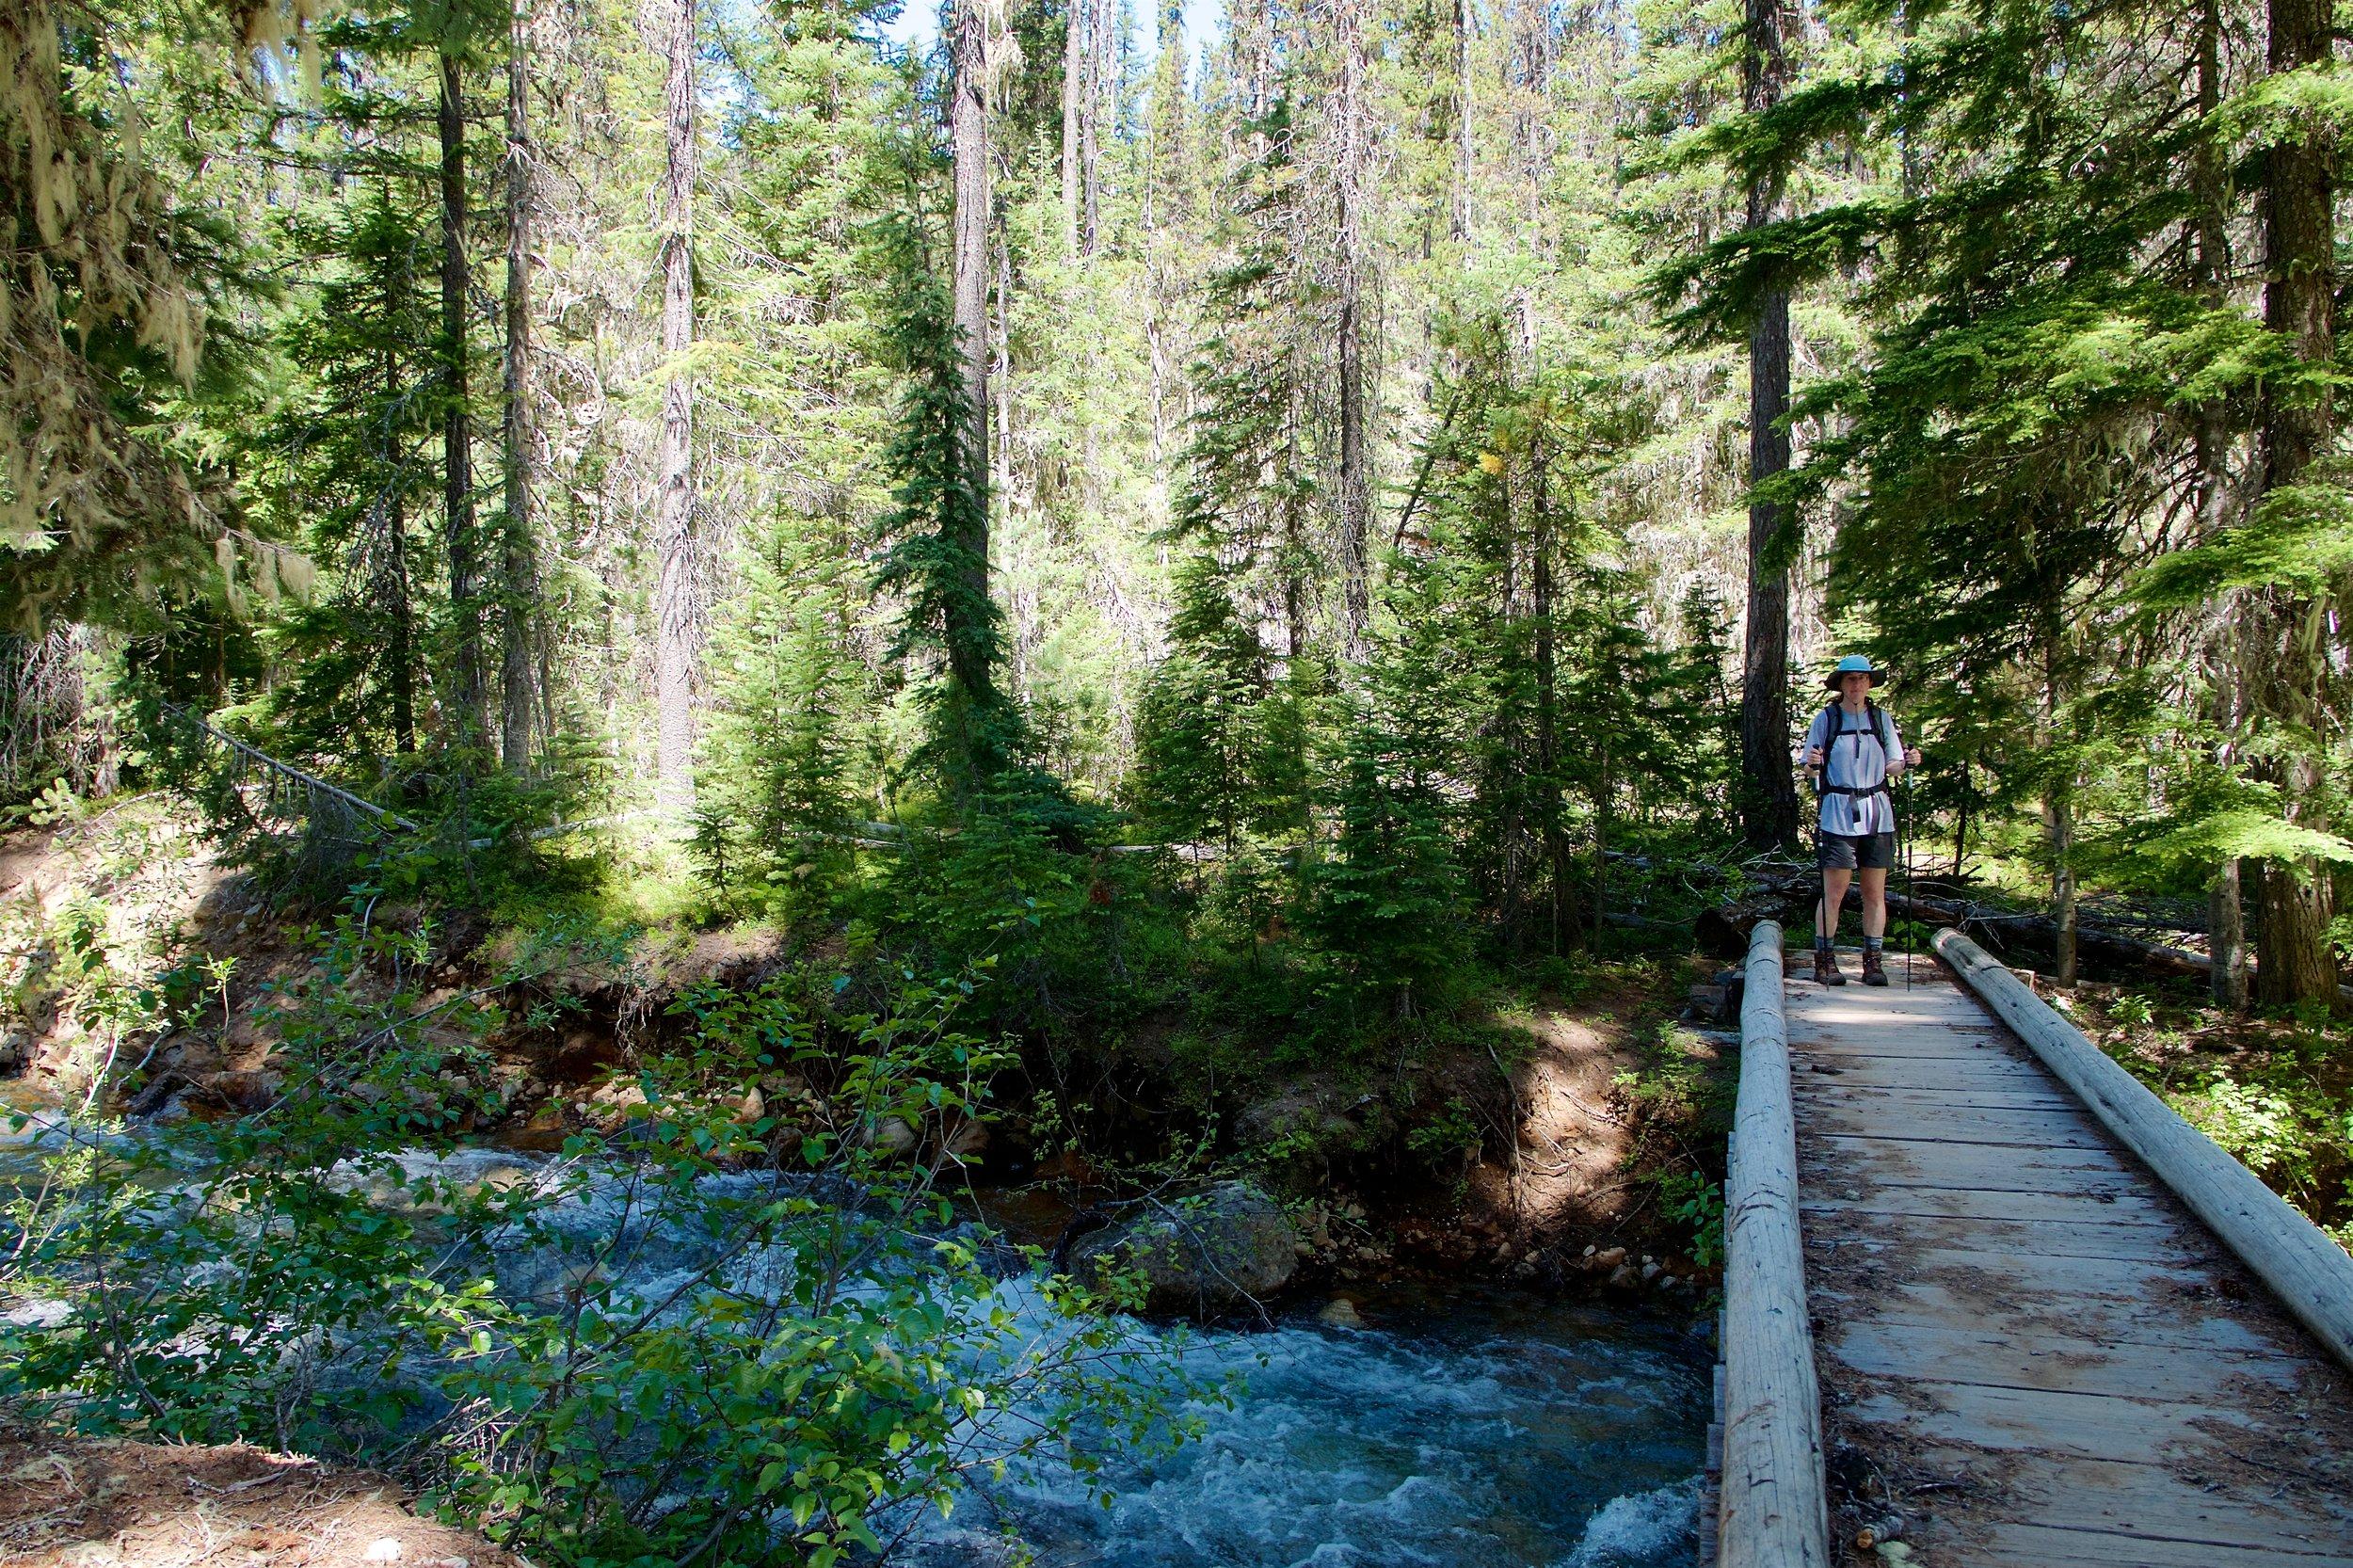 Creek where we had lunch